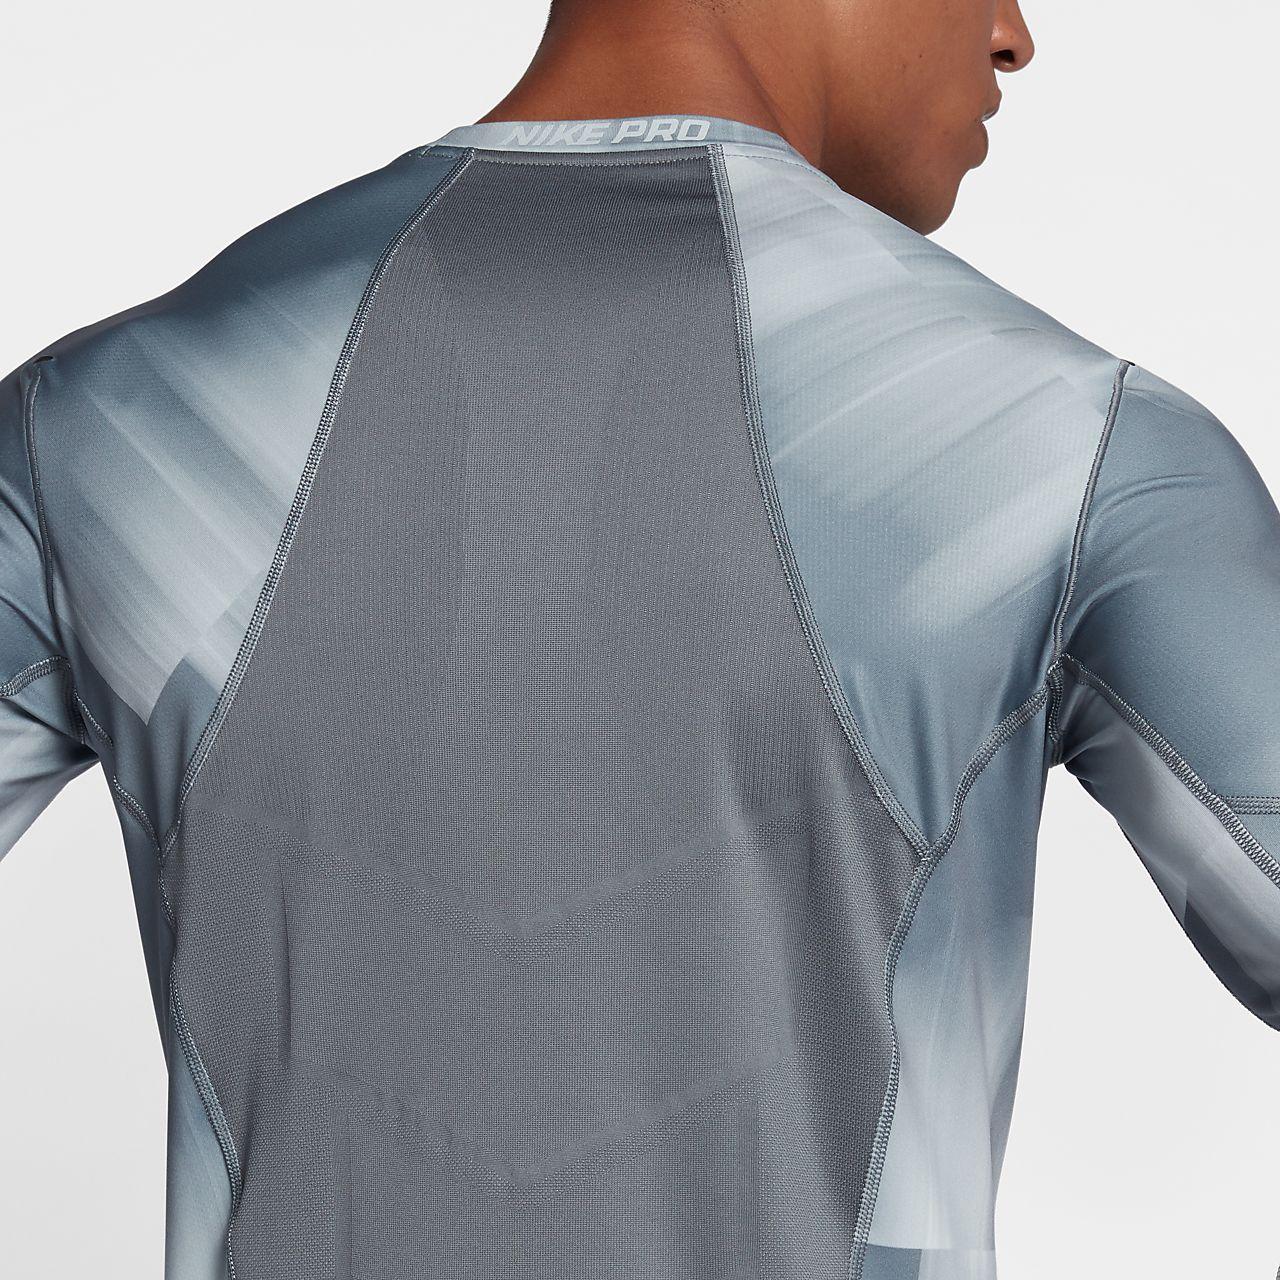 c64ec9542 Nike Pro Hyperwarm Mens Long Sleeve Shirt